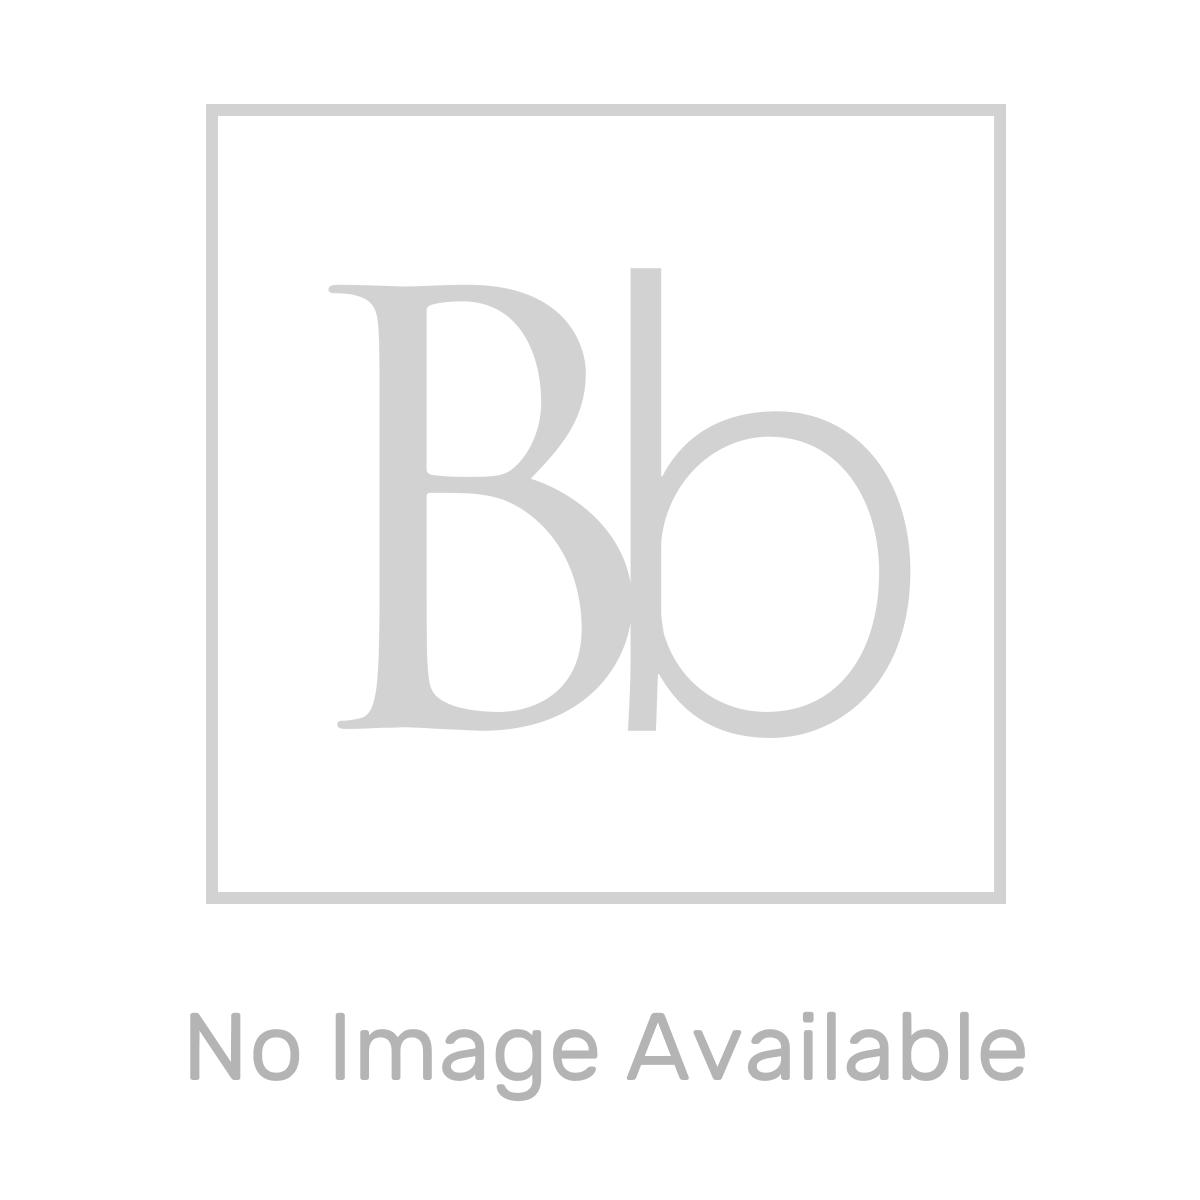 Aquadart Black Slate Shower Tray 1400 x 900